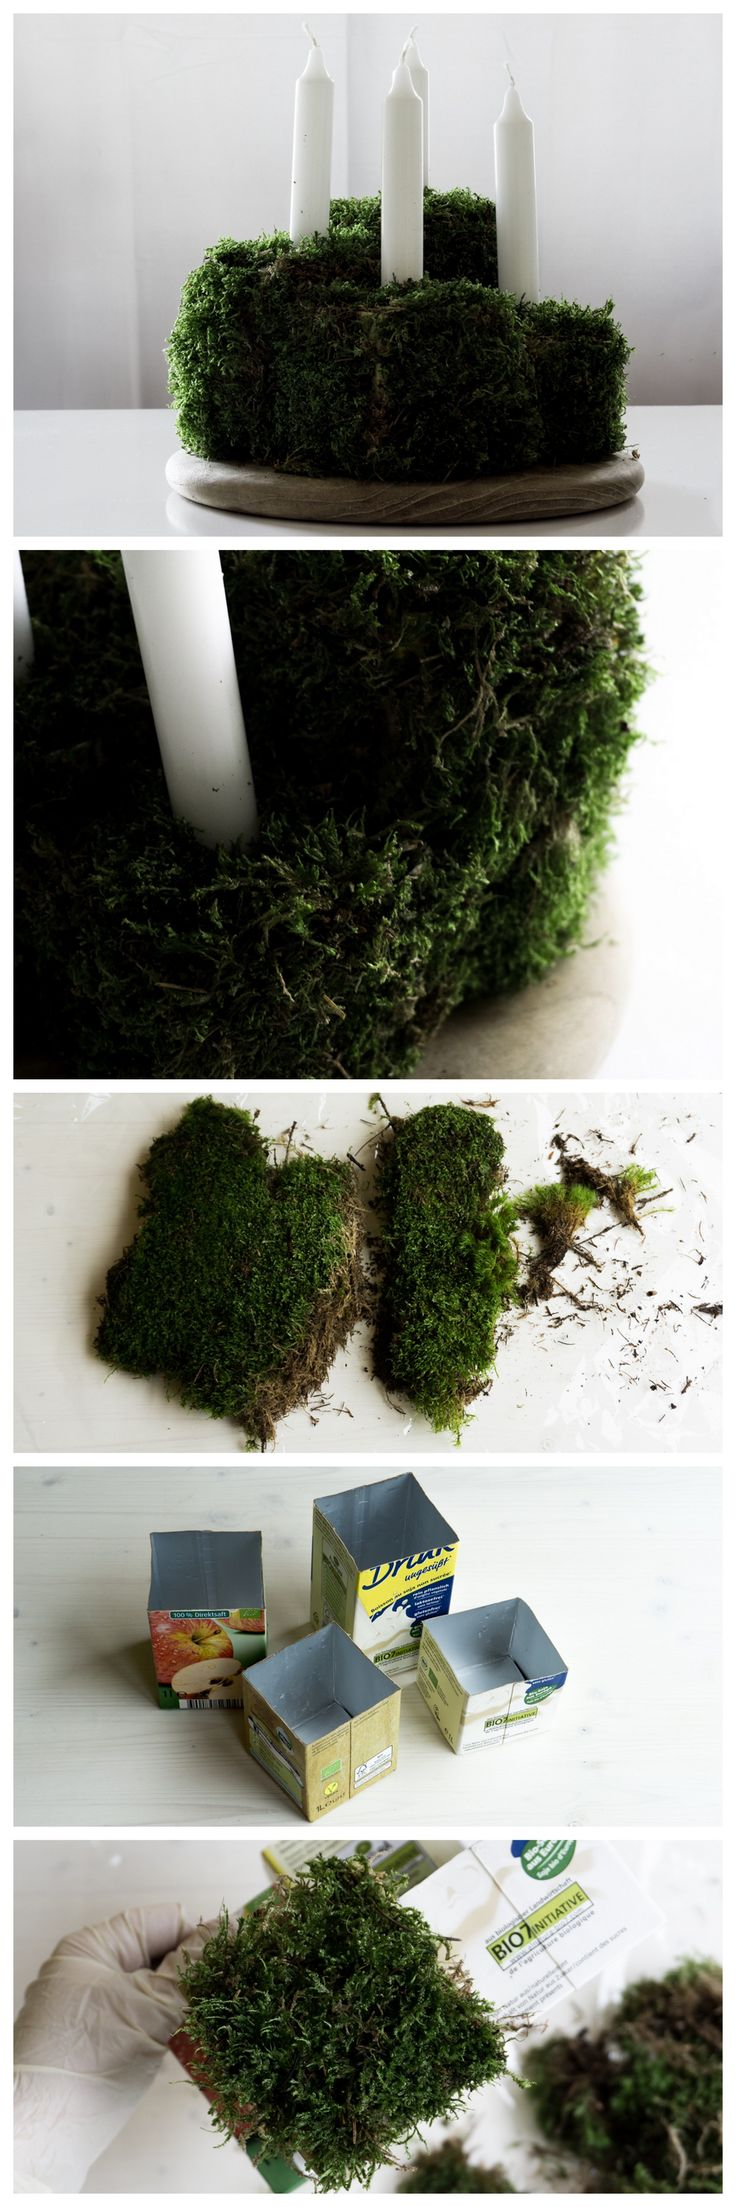 DIY kubischer Upcycling Adventskranz aus Moos und Getränkekartons in skandinavischem Stil || DIY cubic scandinavian style upcycling advent wreath made of moss and beverage cartons